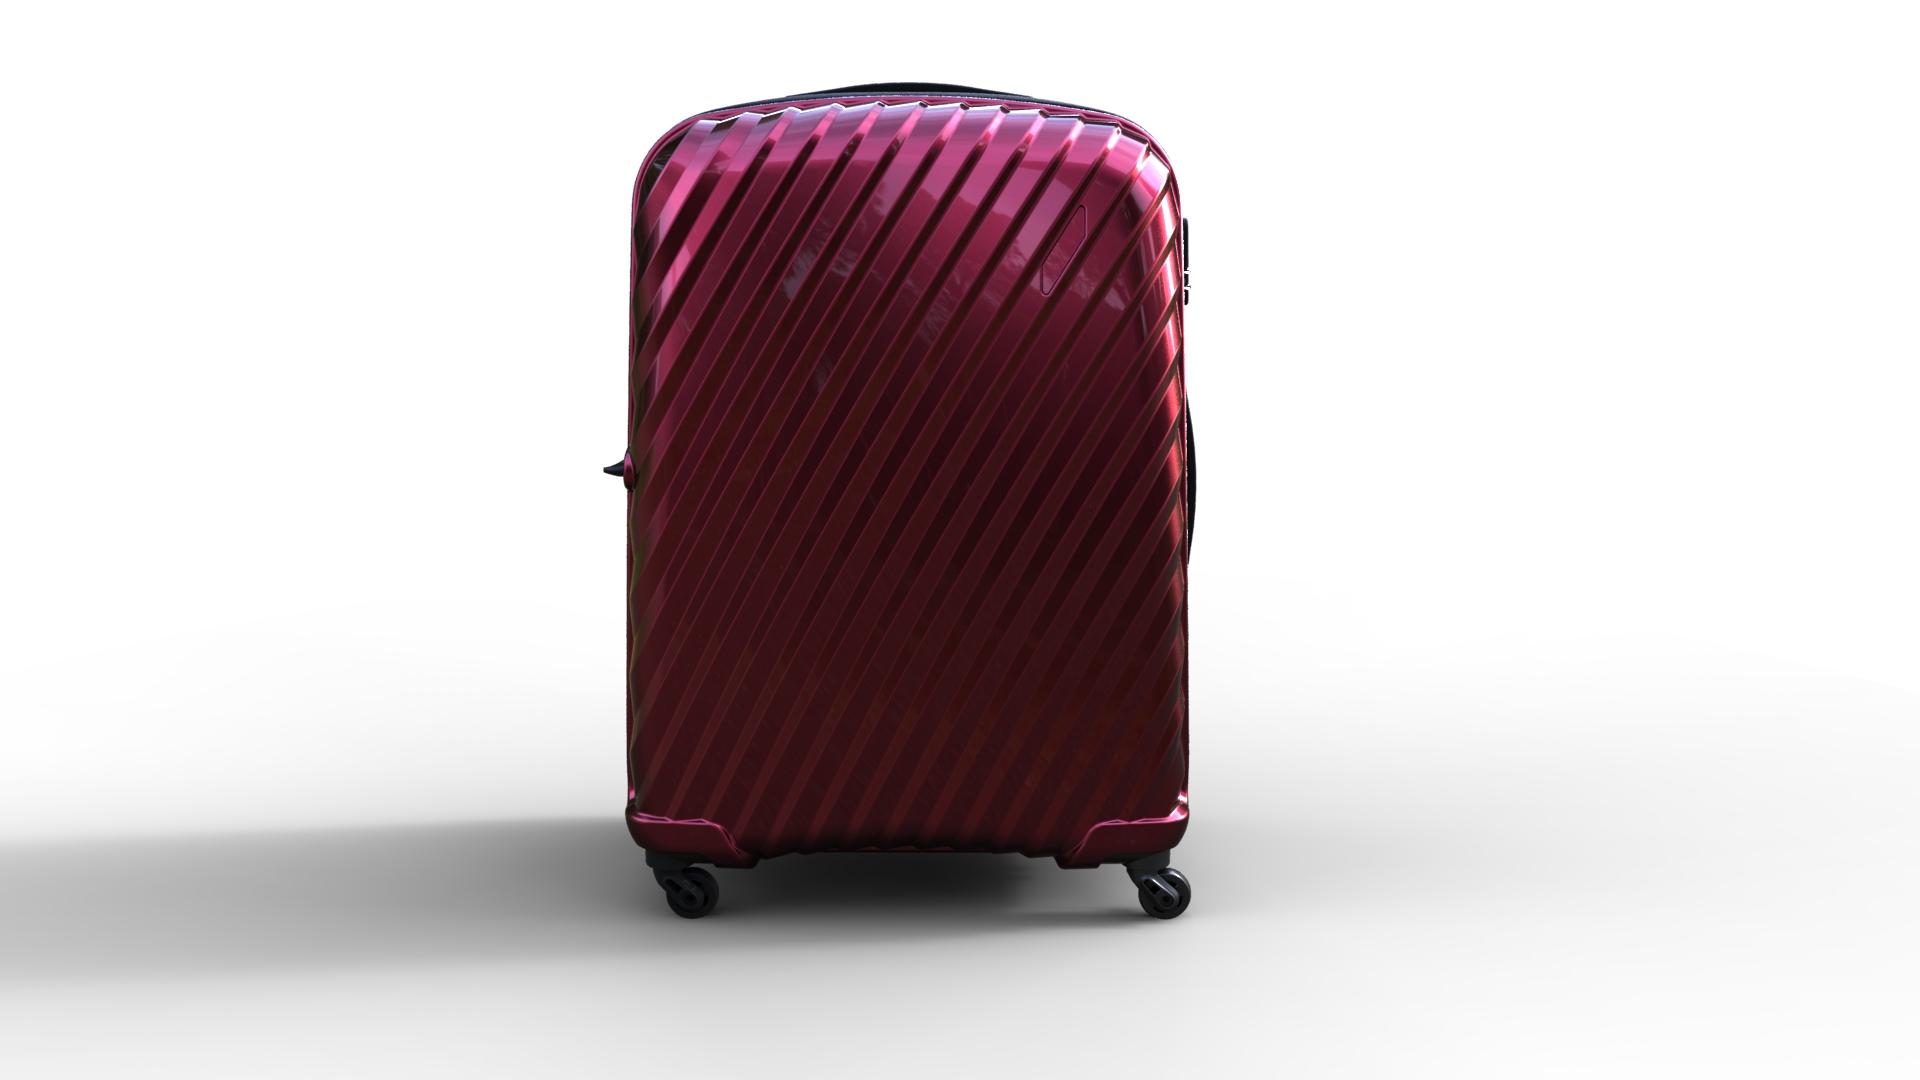 trolley suitcase bag 03 3d model max fbx ma mb obj 285997